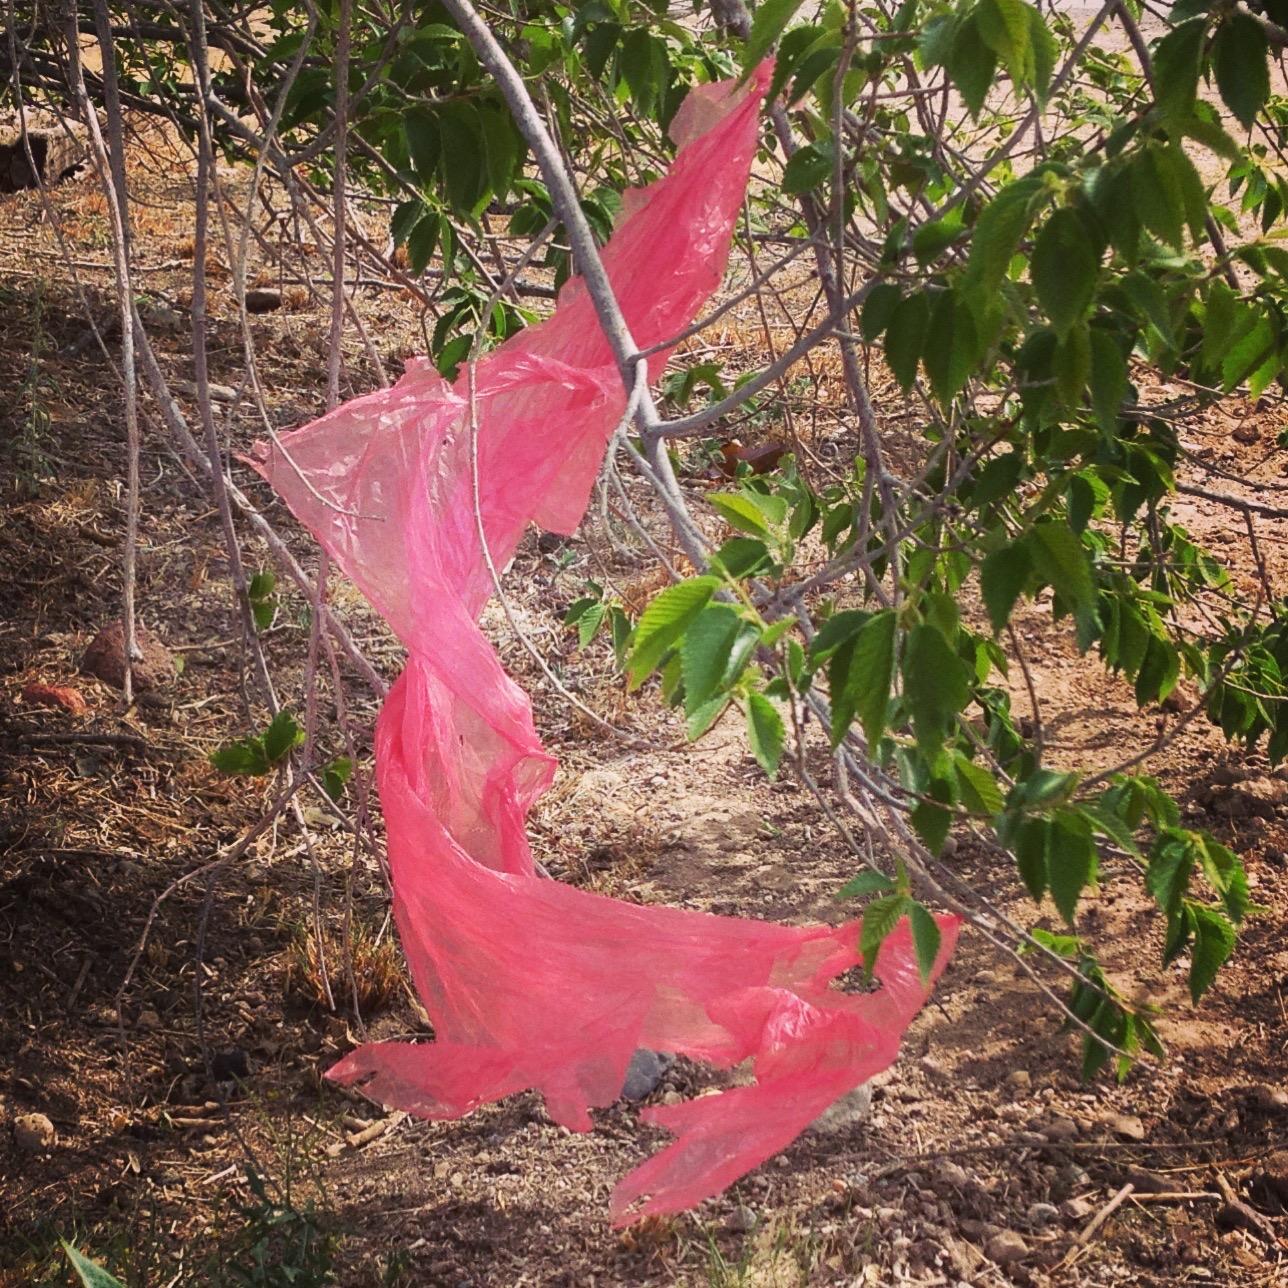 plastic bag of Marfa